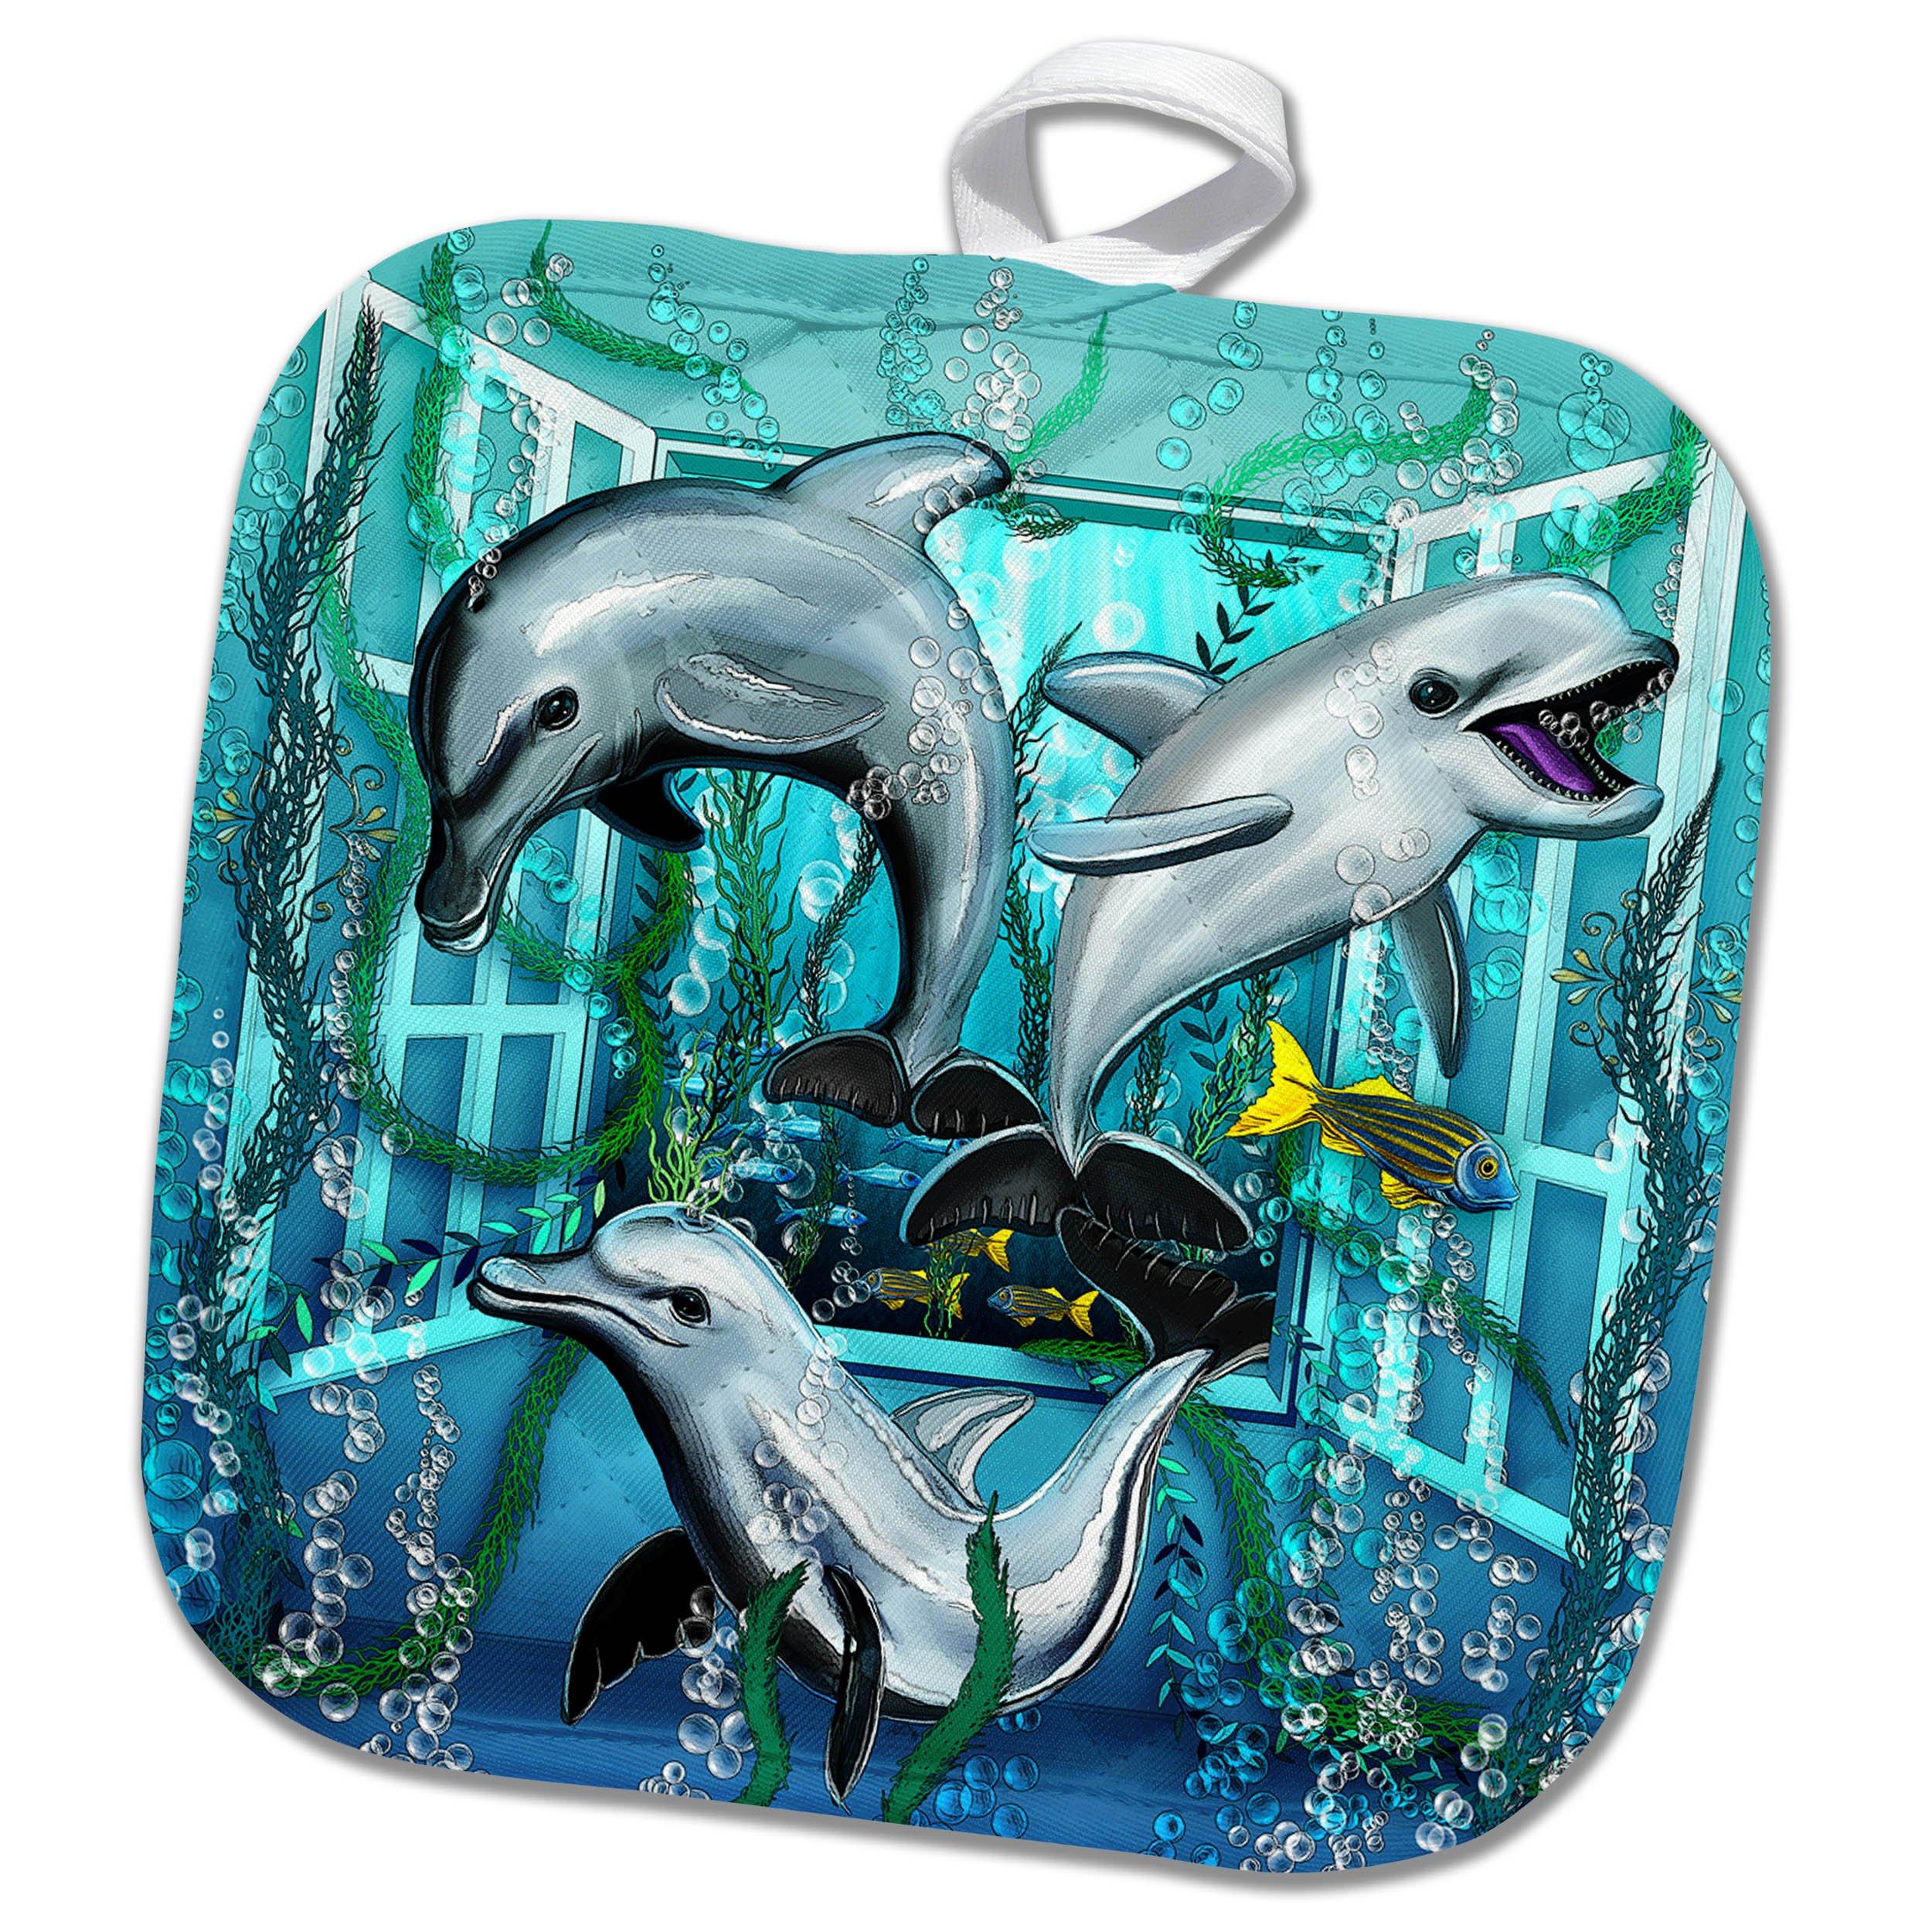 3dRose Dream Essence Designs-The Ocean - Three lively dolphins swim through an open window under the sea - 8x8 Potholder (phl_266090_1)